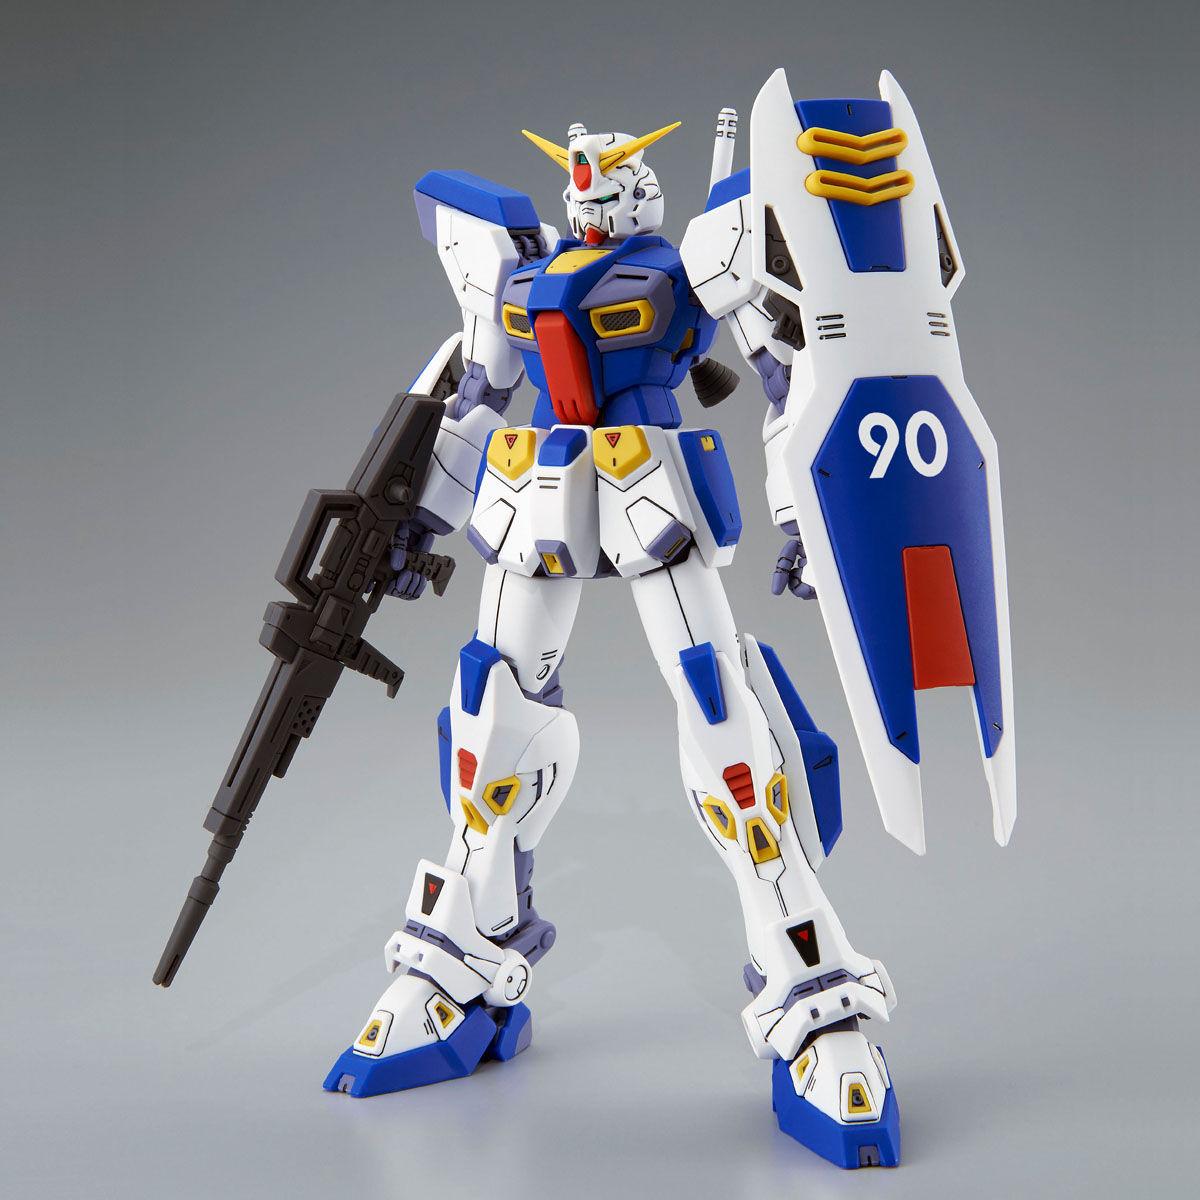 MG Gundam F90 1